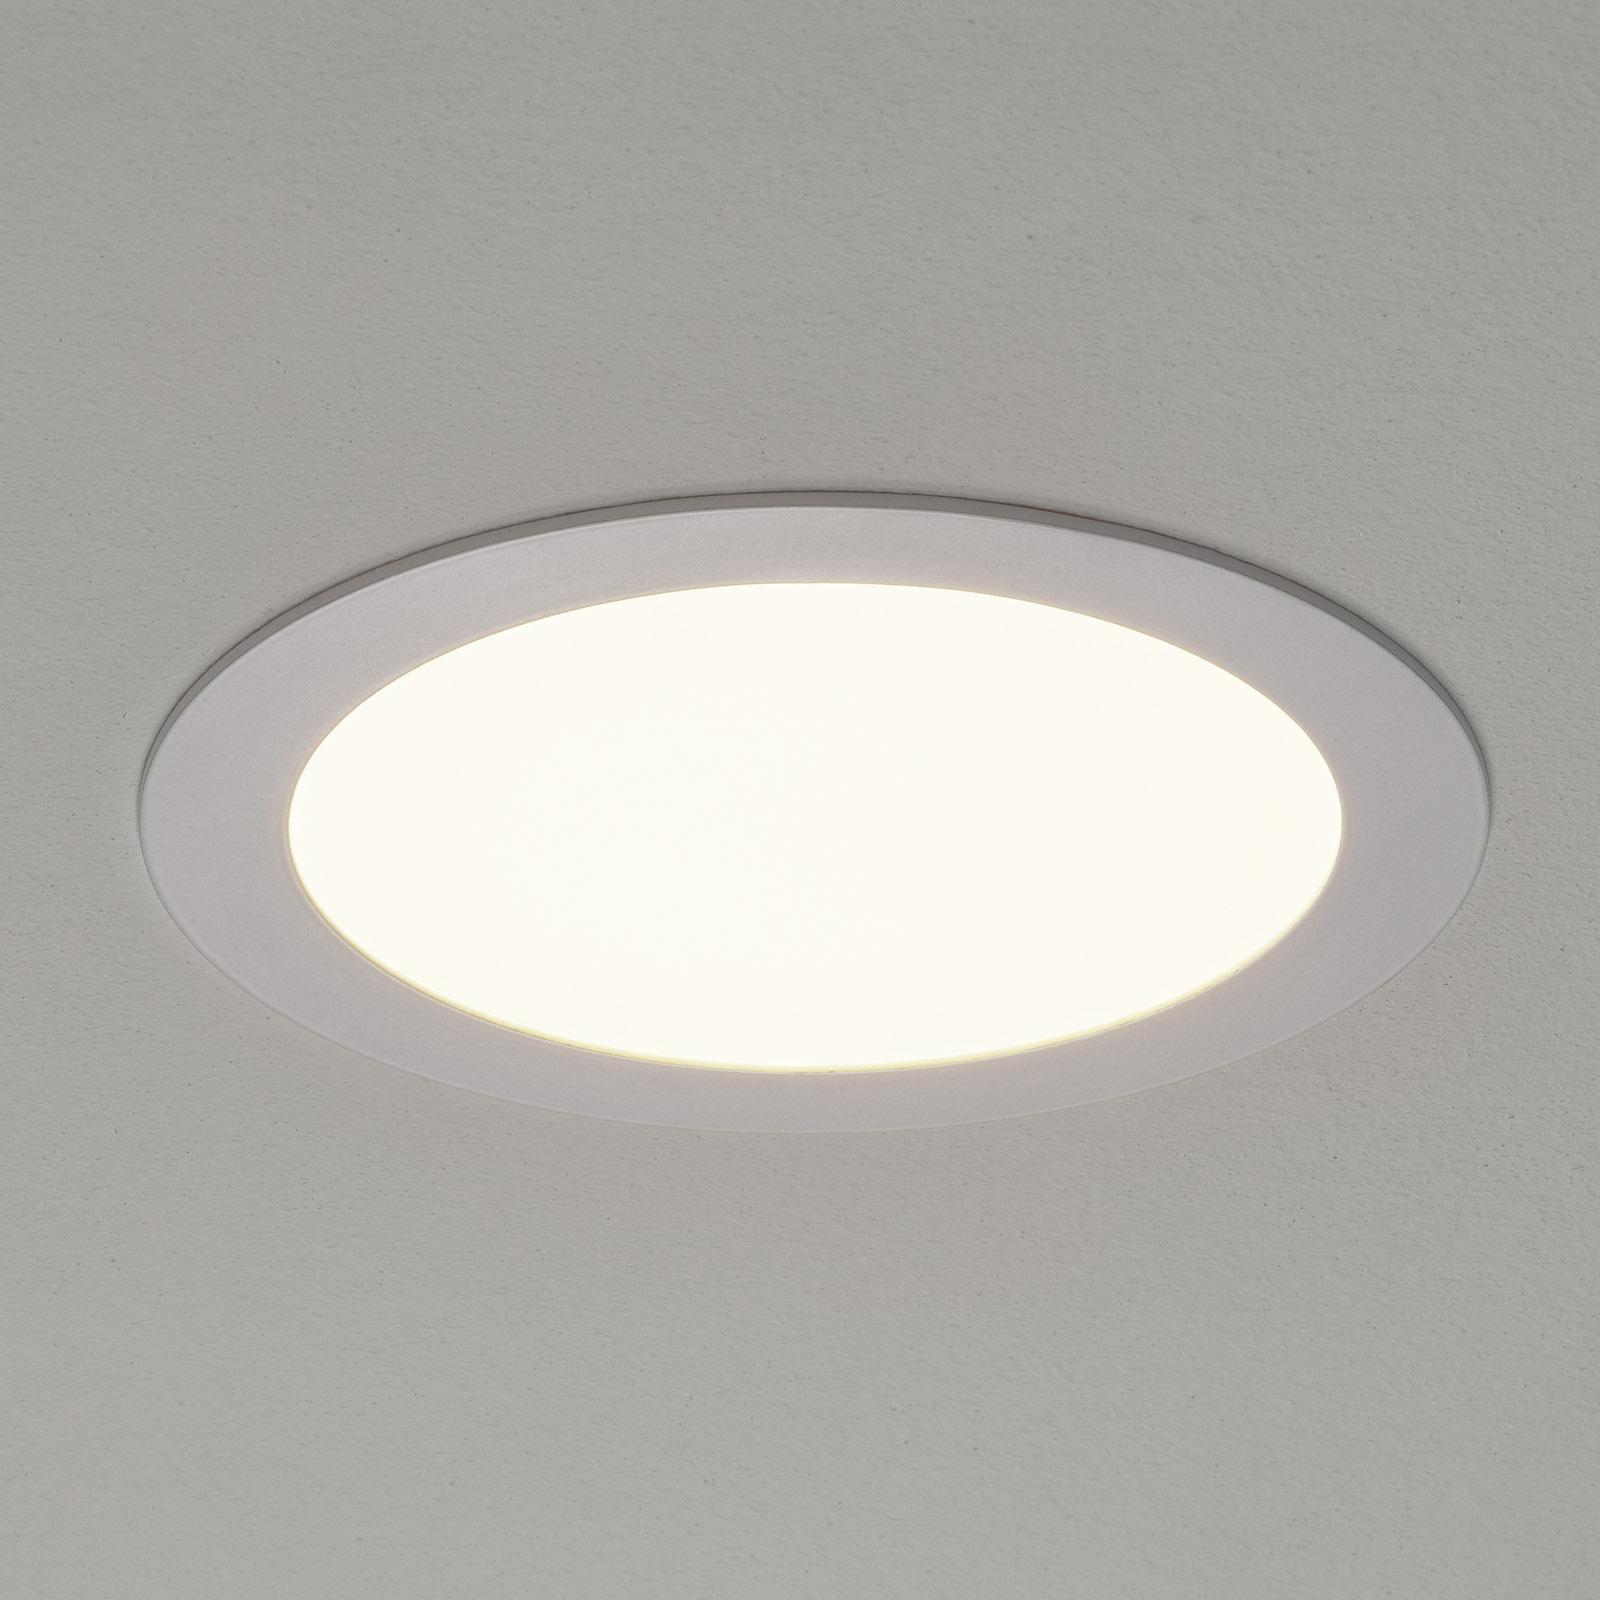 Eglo Connect Fueva-C innfellingslampe hvit 22,5 cm